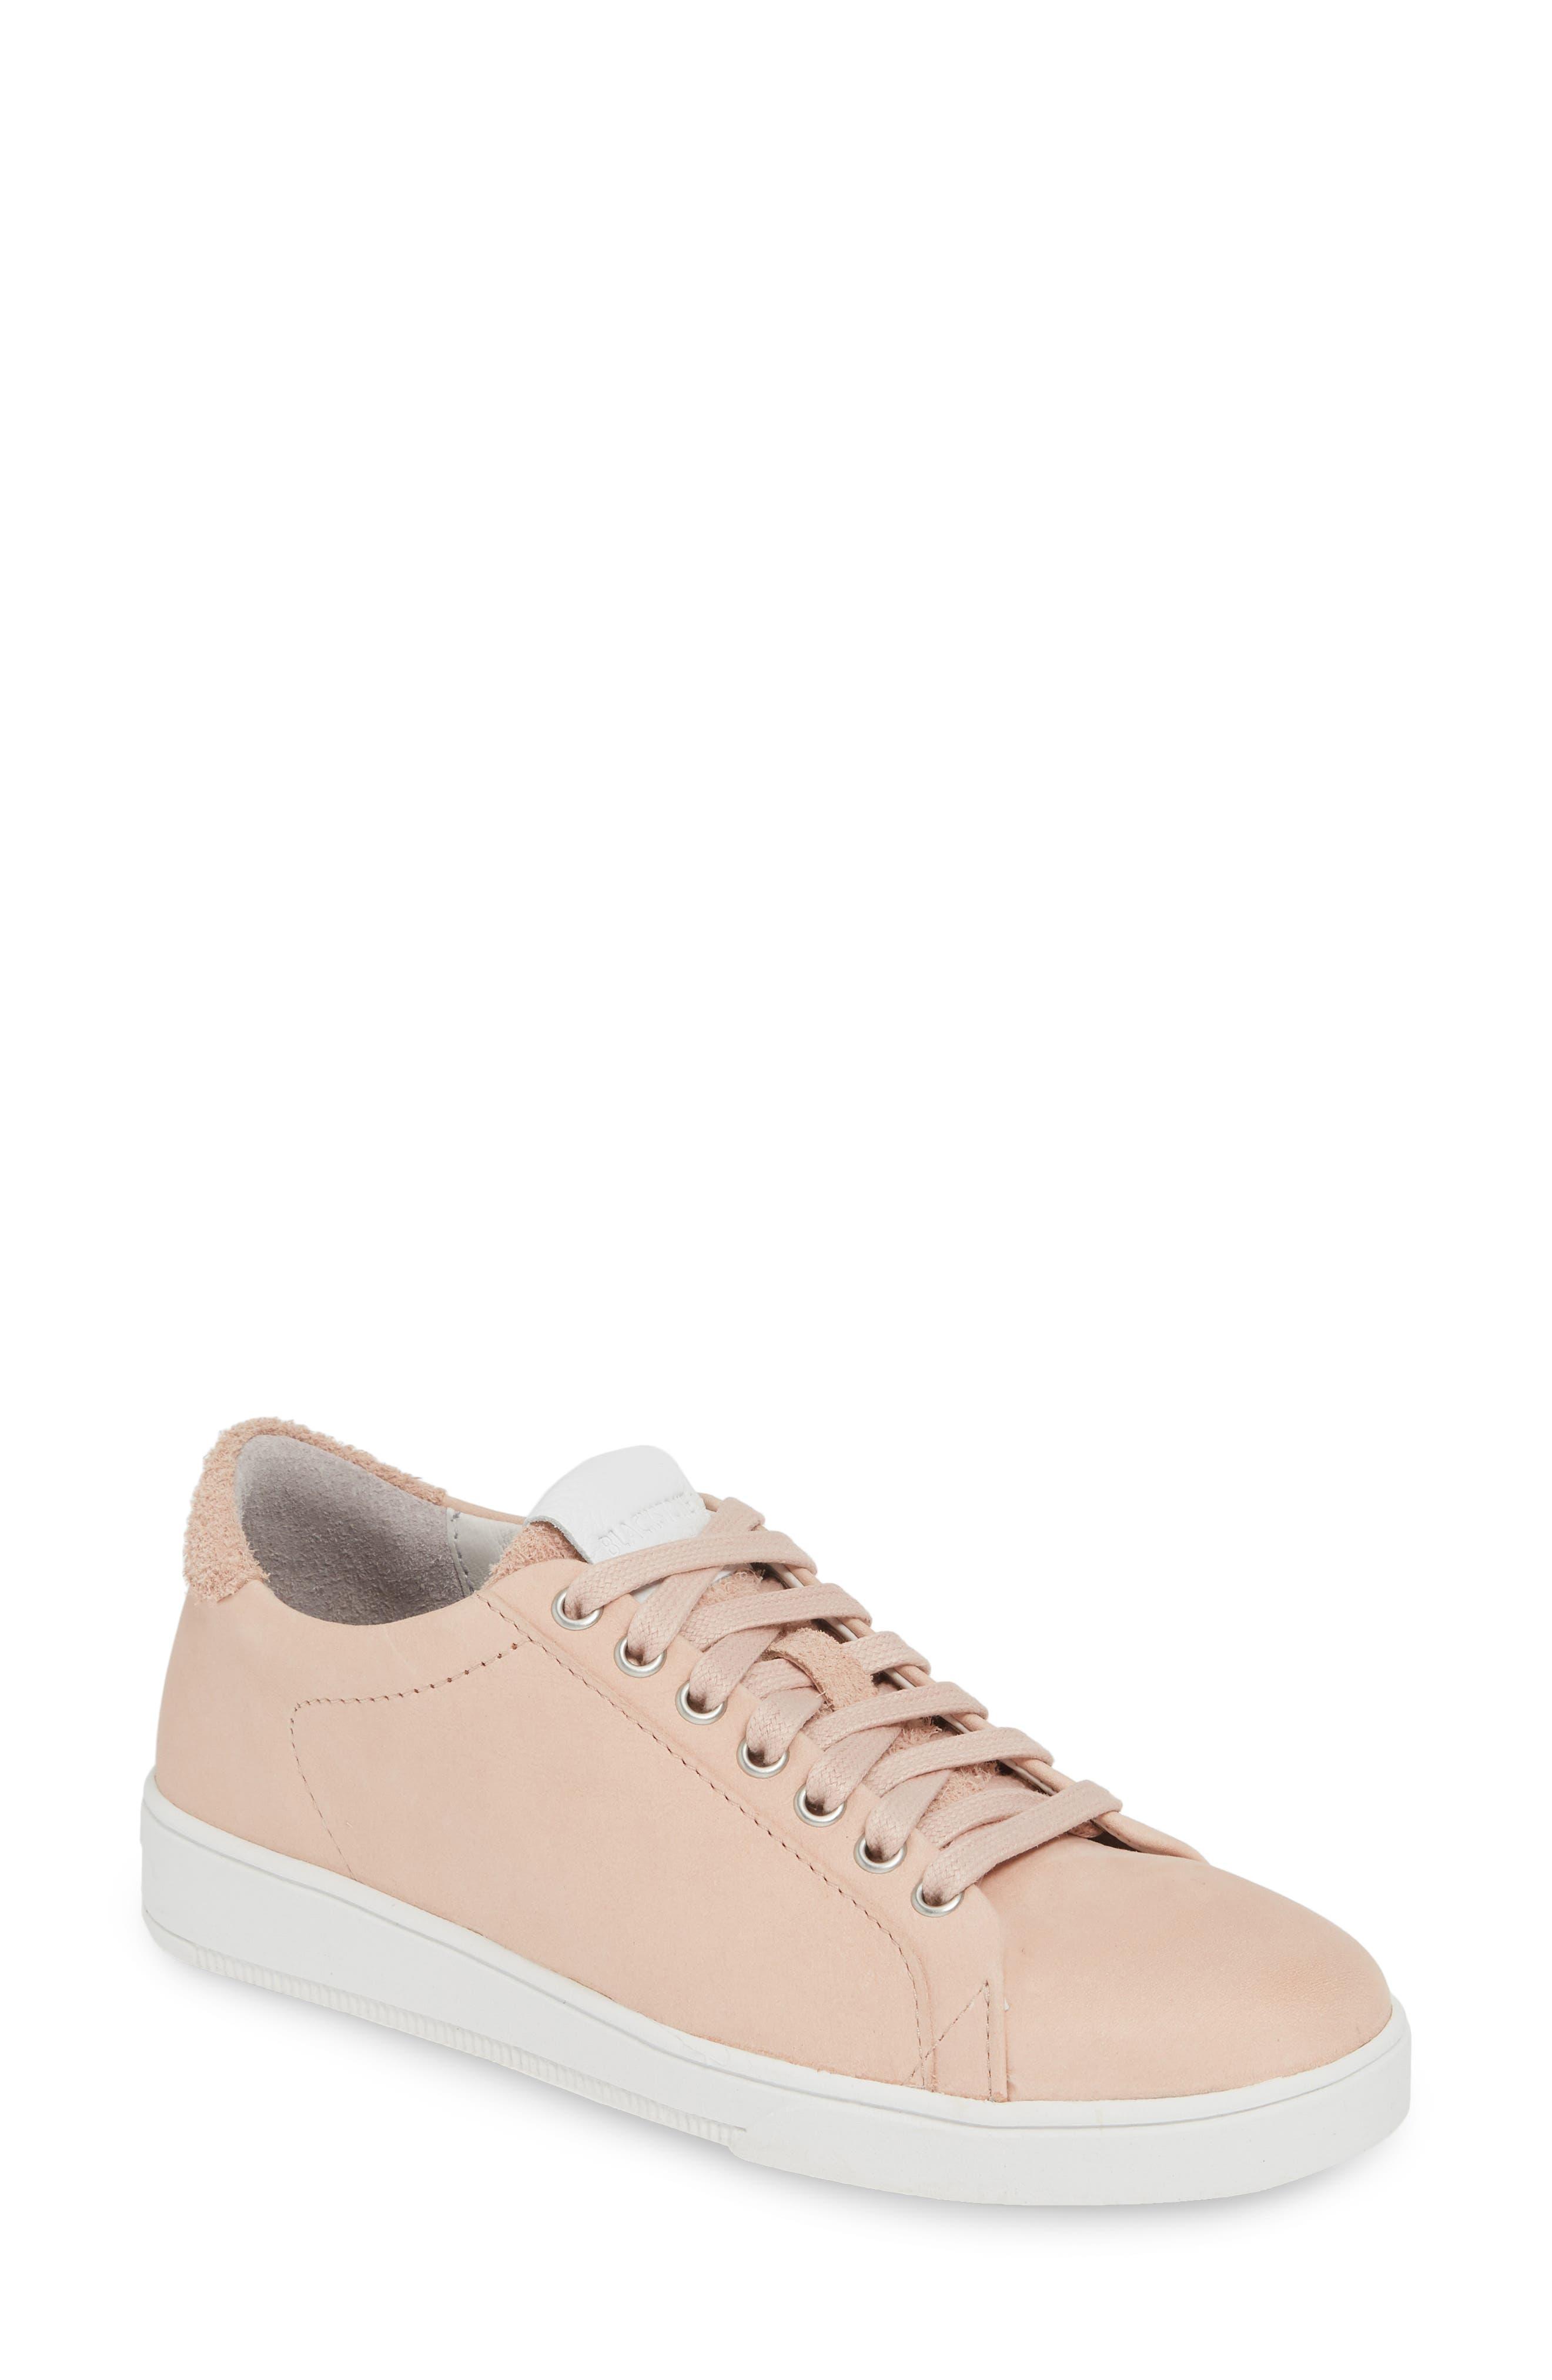 Blackstone Rl85 Low Top Sneaker, Pink